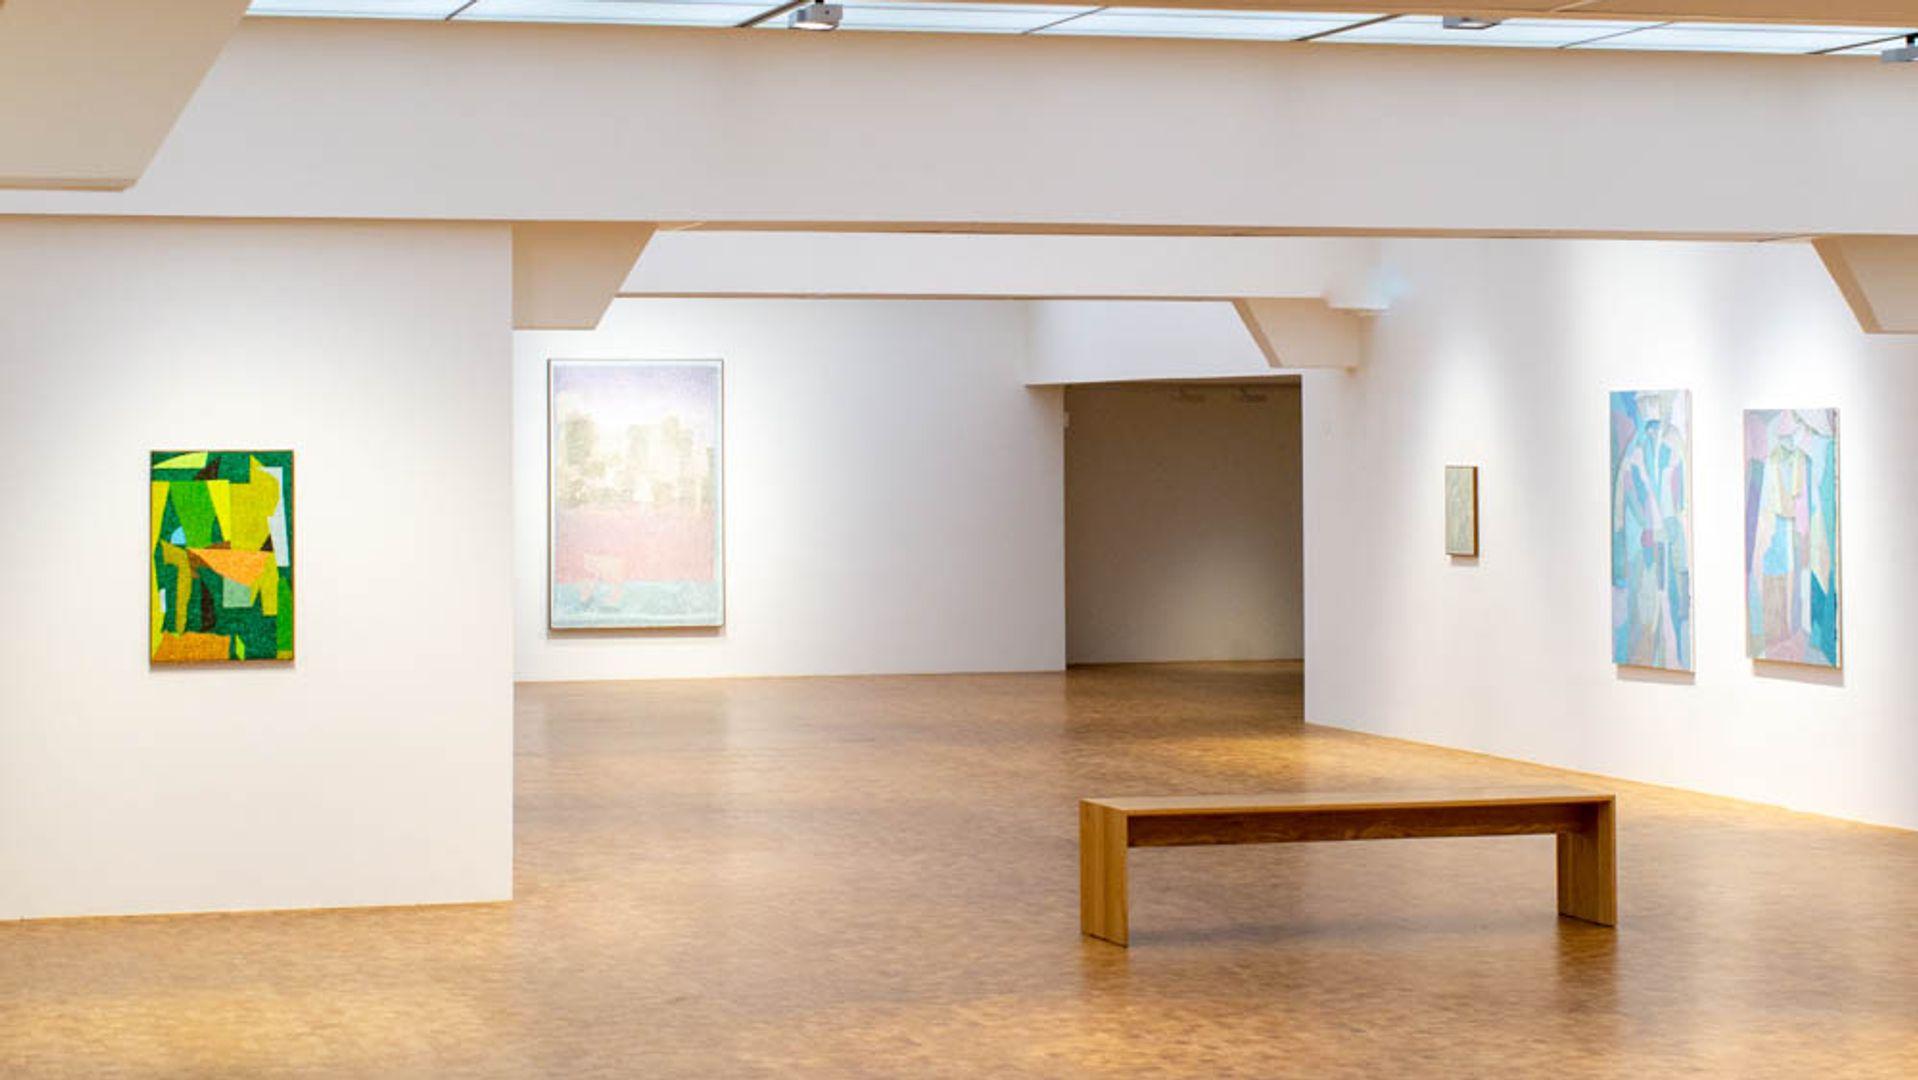 KHÅK Kunsthall